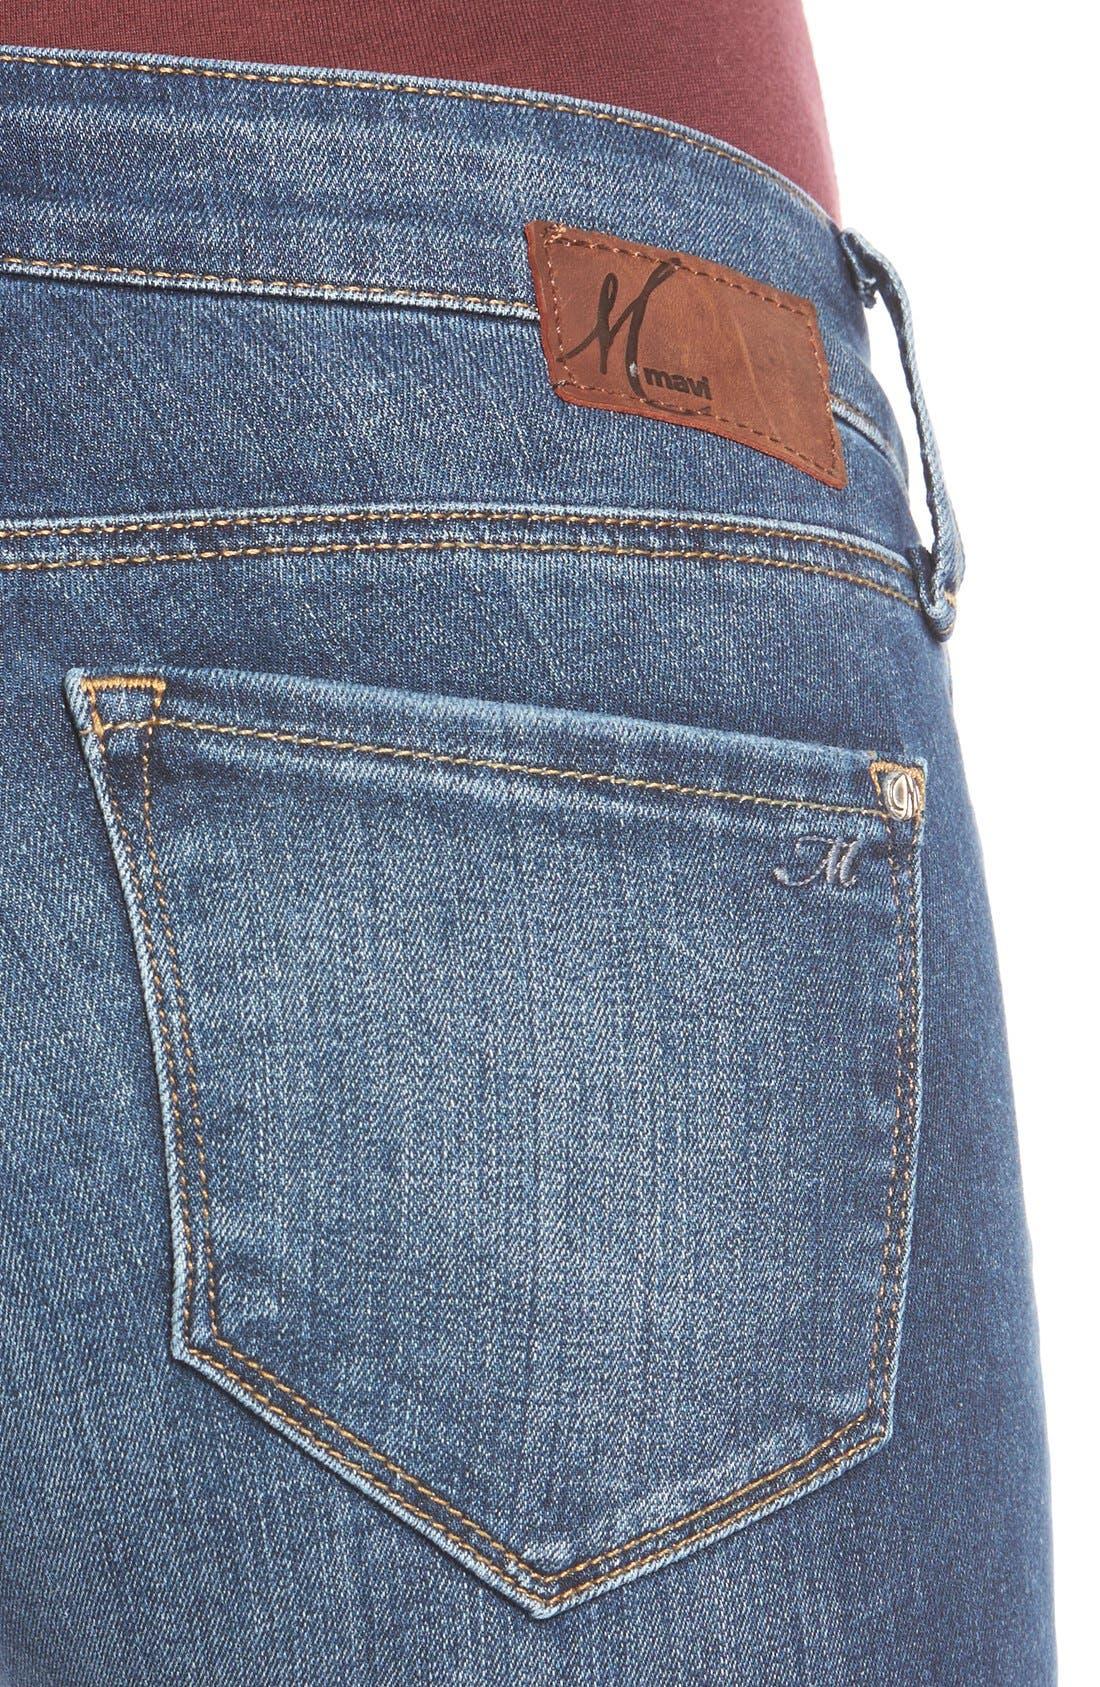 Alternate Image 4  - Mavi Jeans 'Serena' Stretch Low Rise Skinny Jeans (Indigo Nolita)